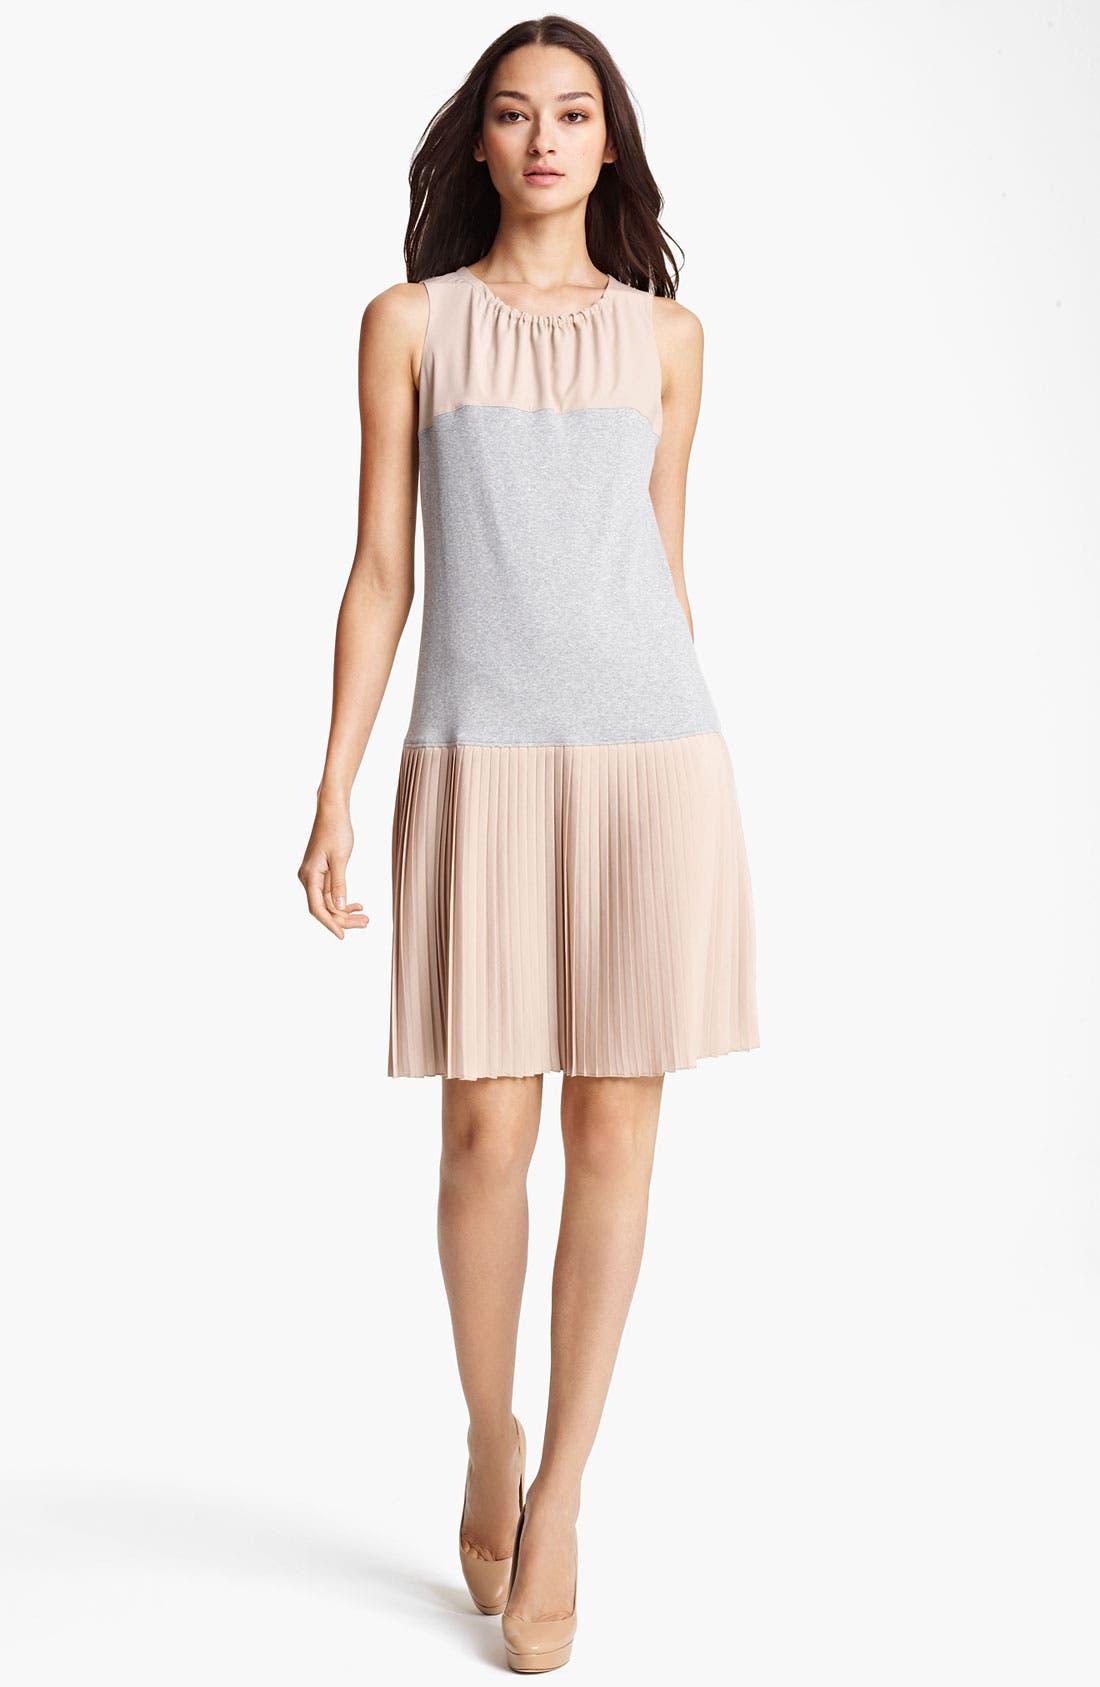 Alternate Image 1 Selected - Fabiana Filippi Crepe & Rib Knit Dress